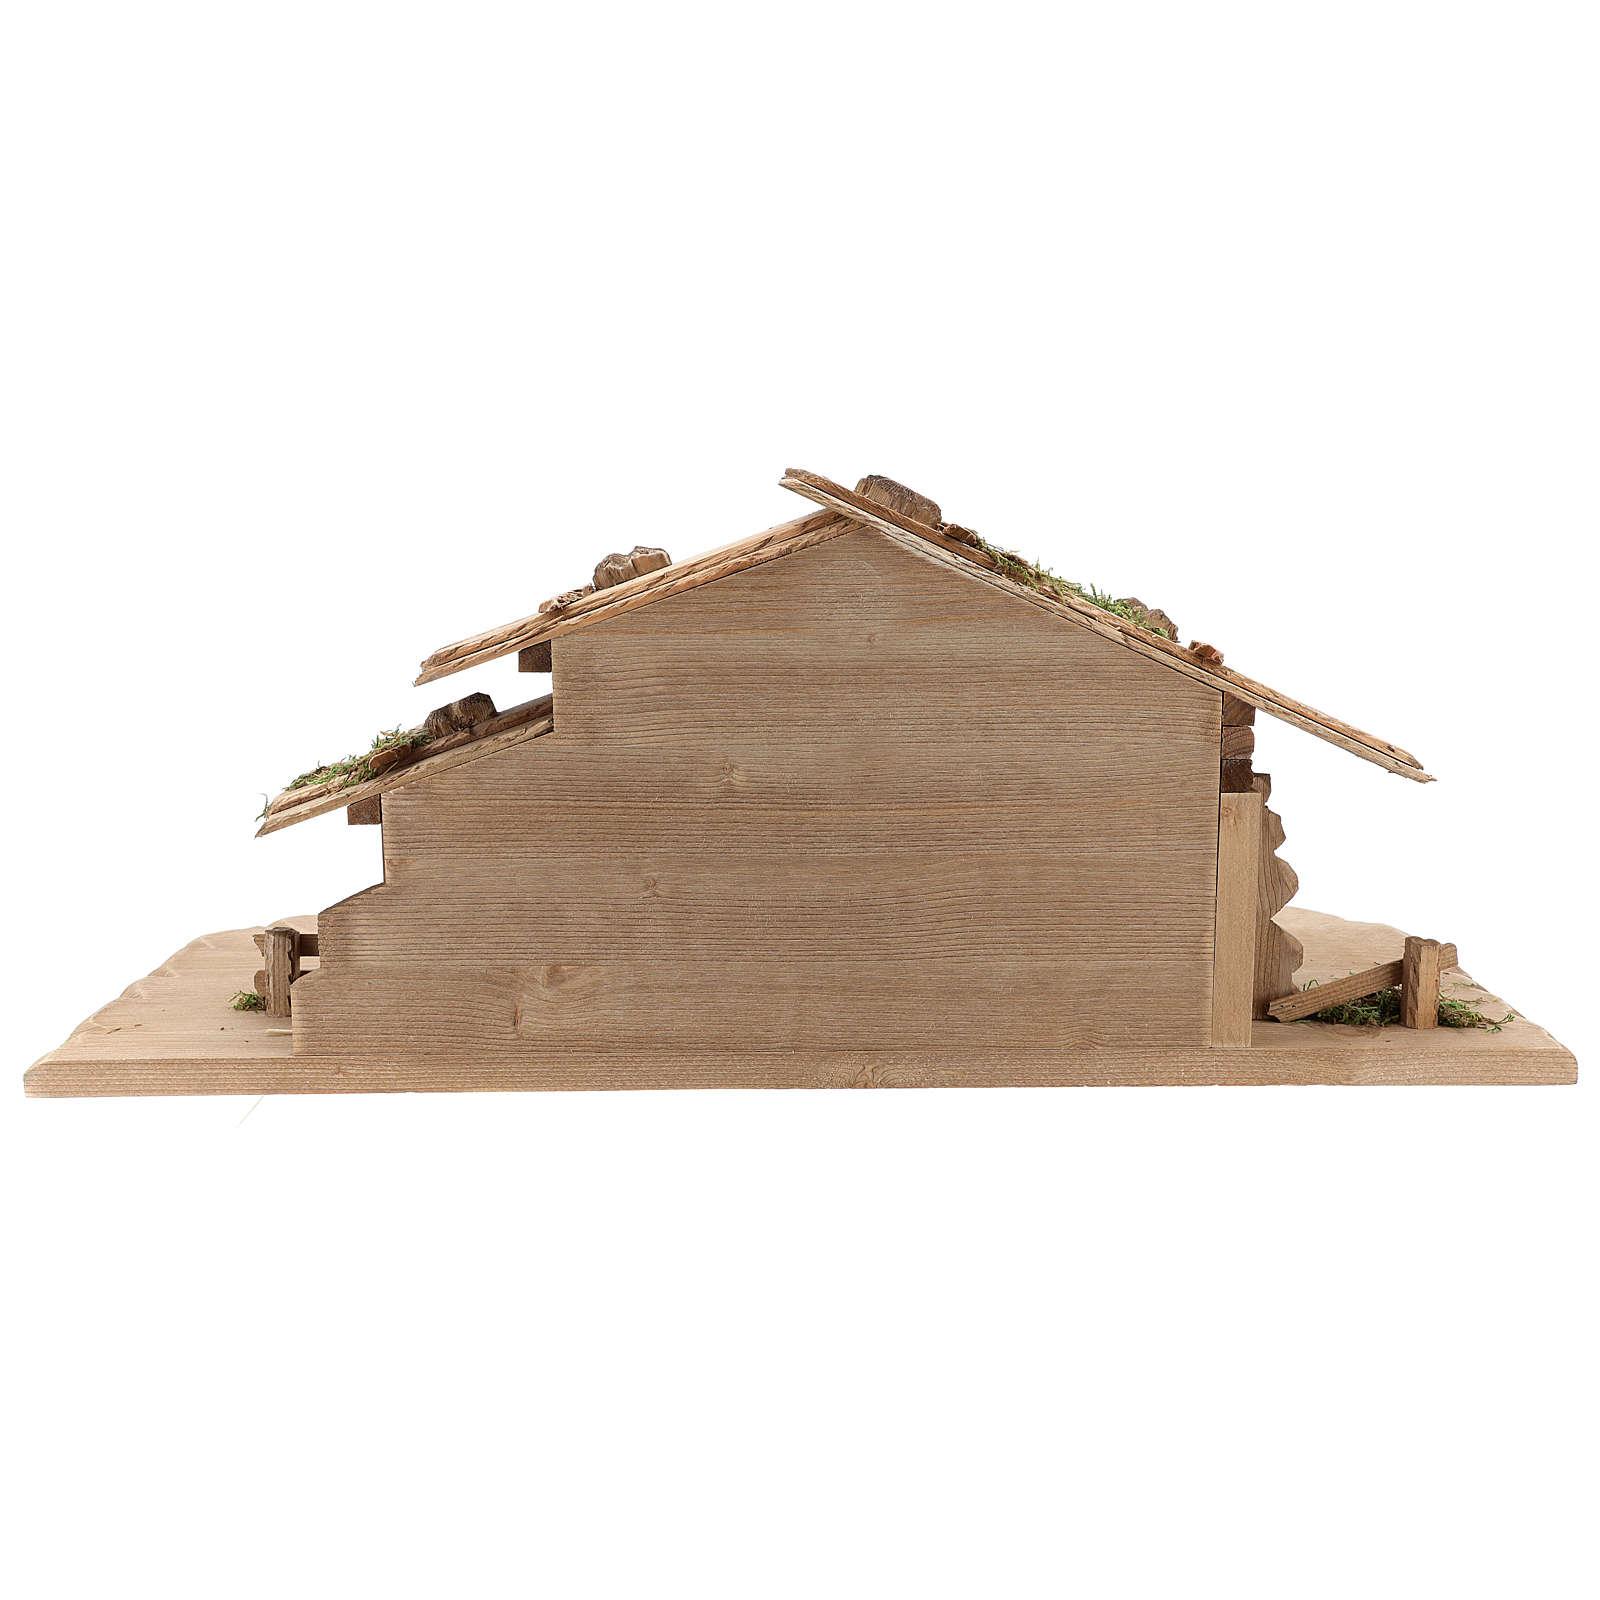 Cabaña Noche Sagrada set 12 piezas madera pintada belén Rainell 9 cm 4